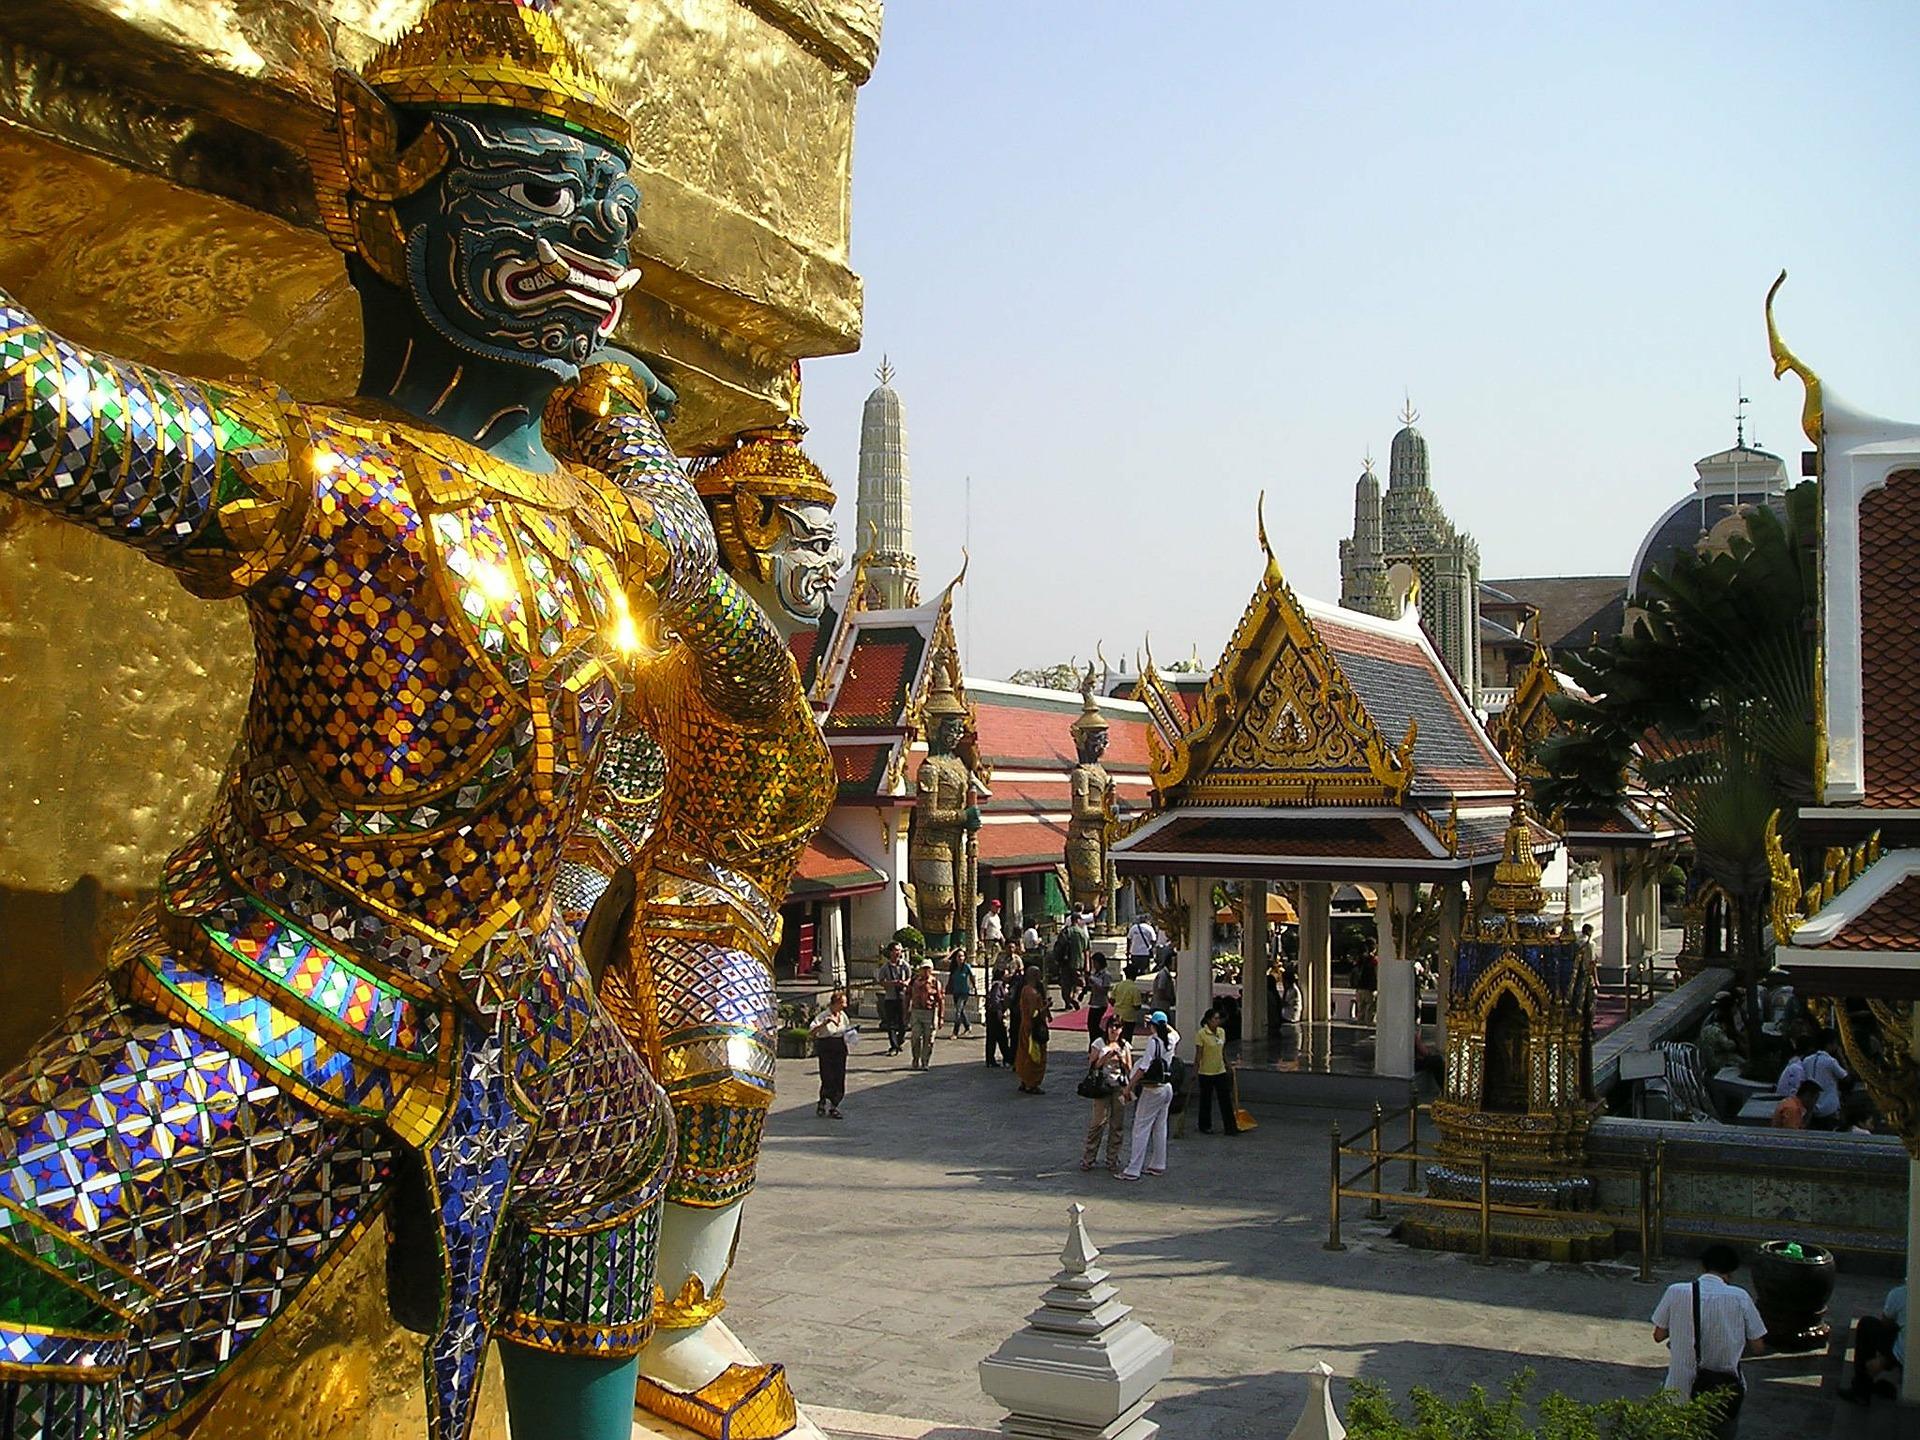 thailand-424_1920.jpg